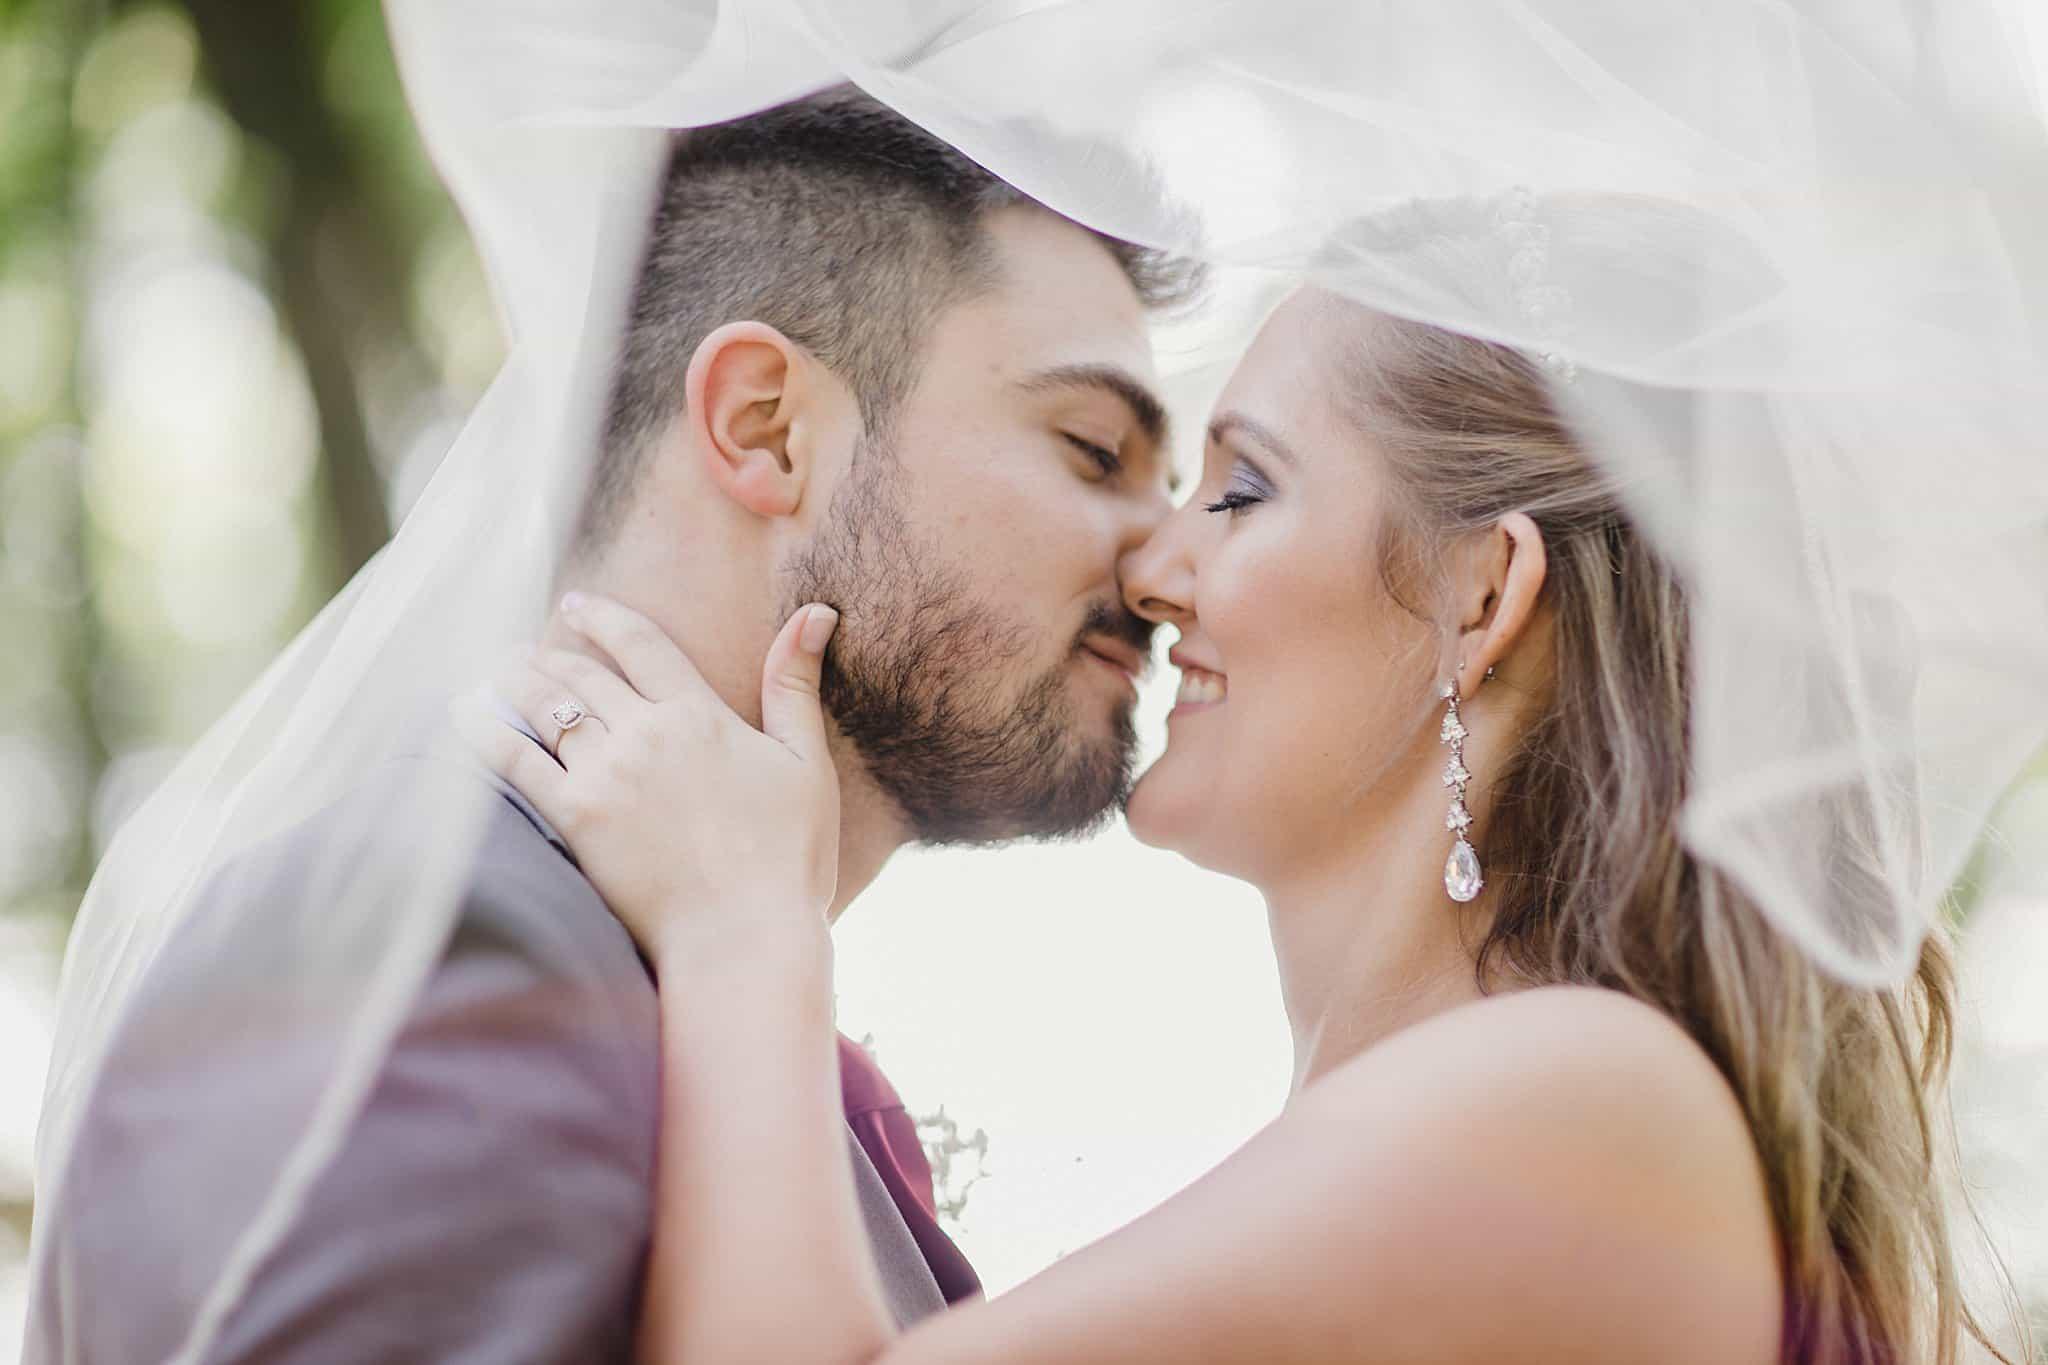 Erin & Luke - Emotional Wedding of High School Sweethearts at Duck Pond Manor, Tennessee